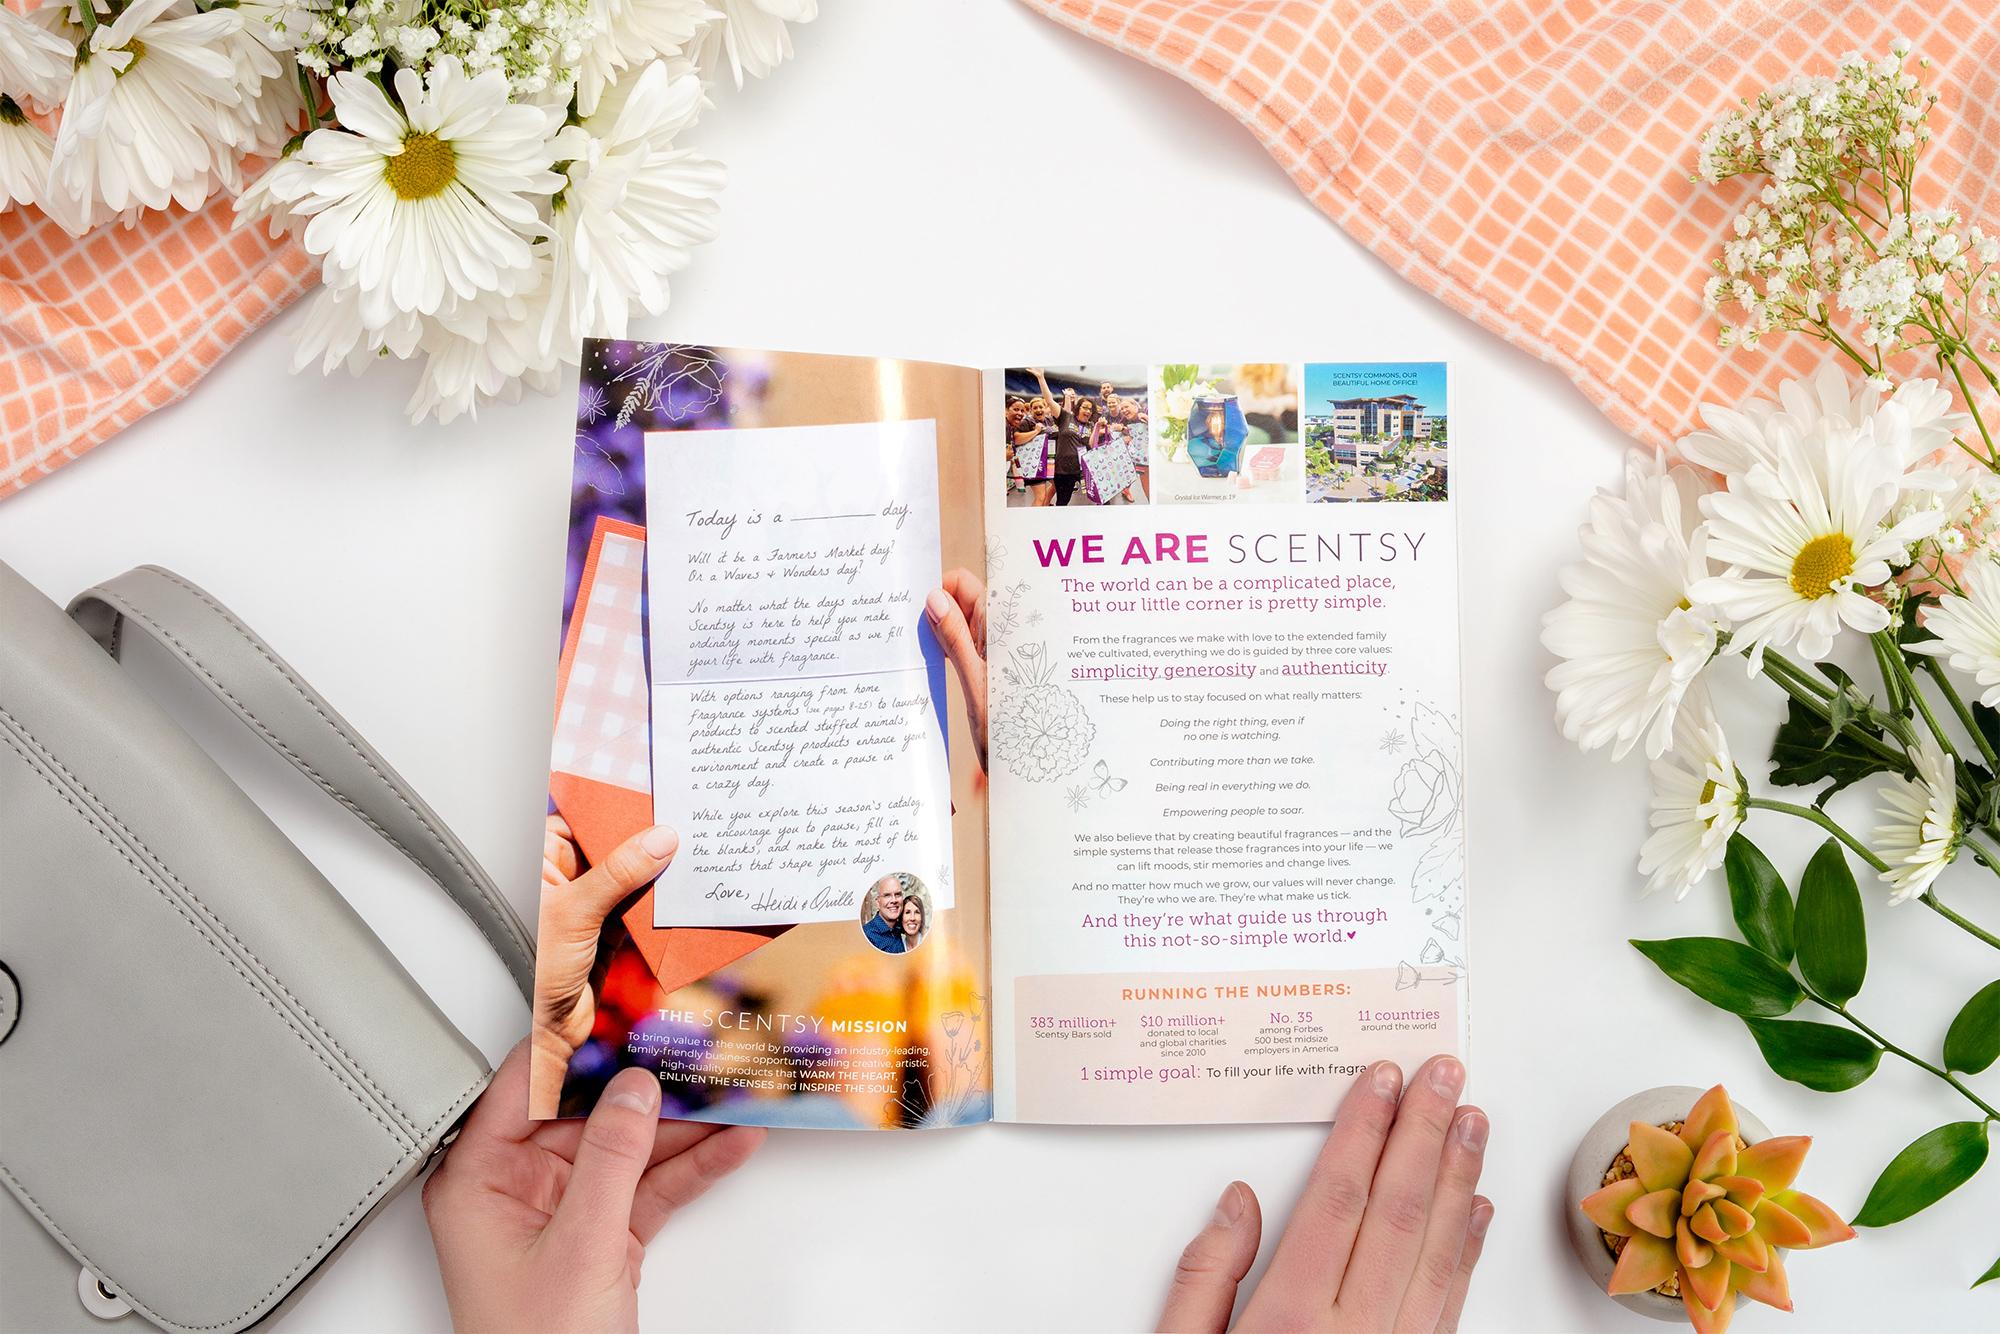 consultant flipping through new spring summer 2019 catalog